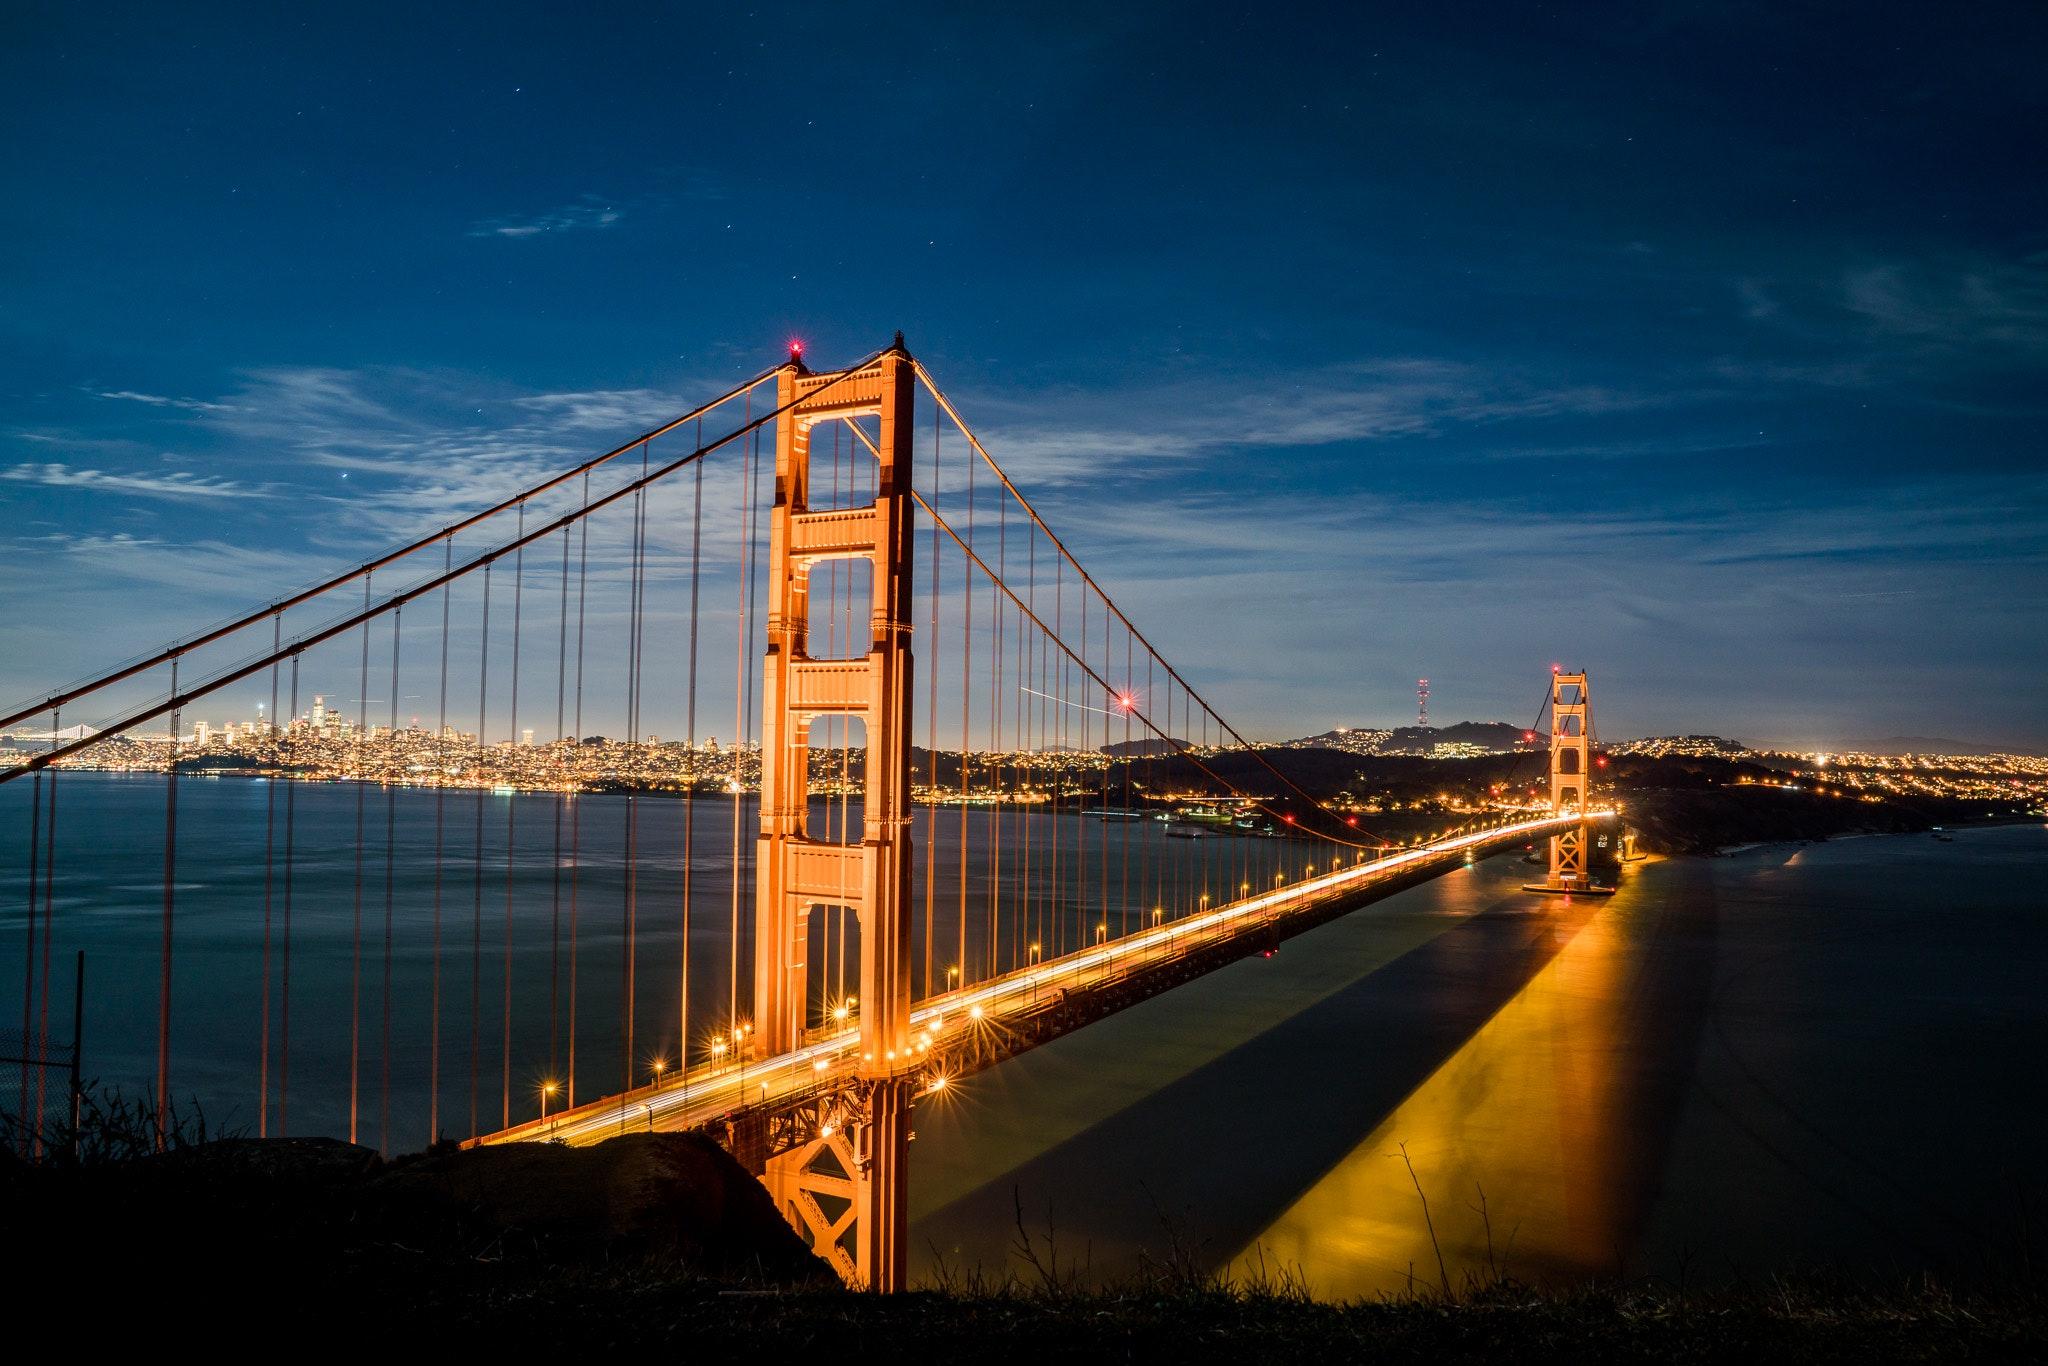 Golden Gate Bridge, Architecture, Urban, Travel, Transportation system, HQ Photo